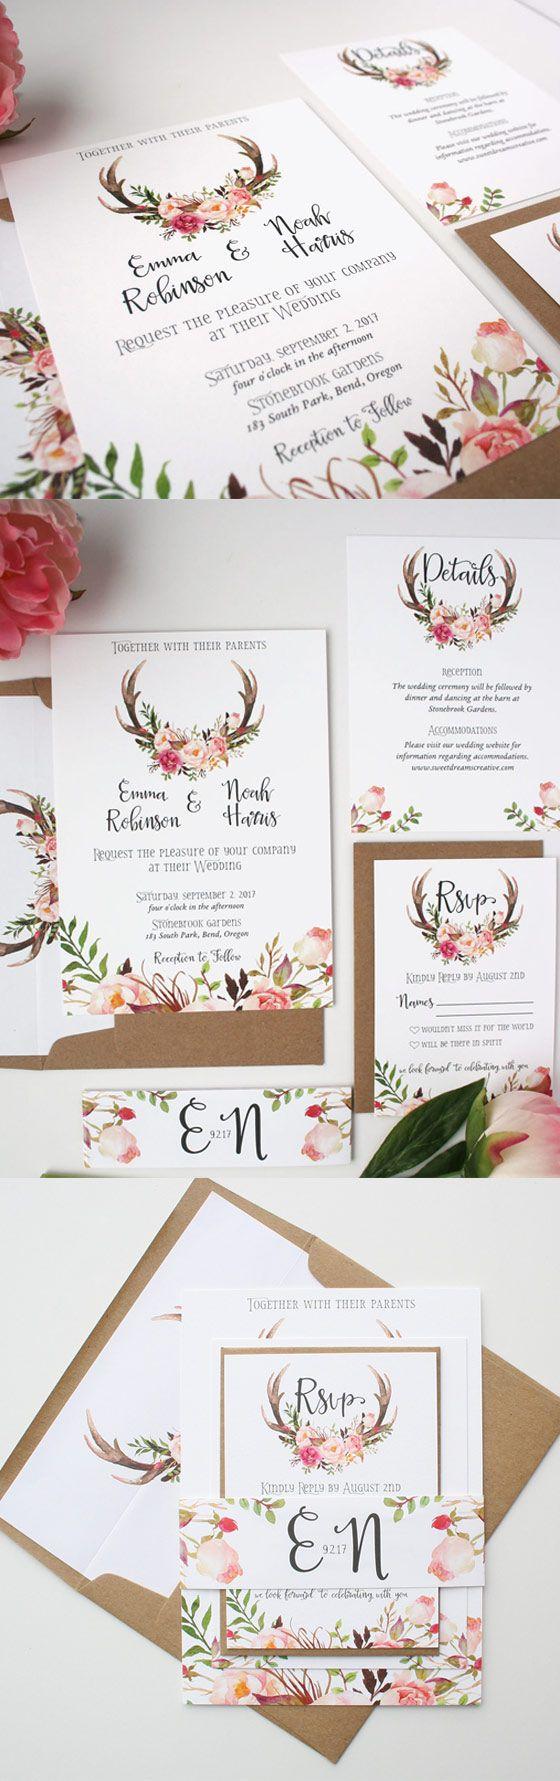 Antler wedding invitations for a rustic wedding